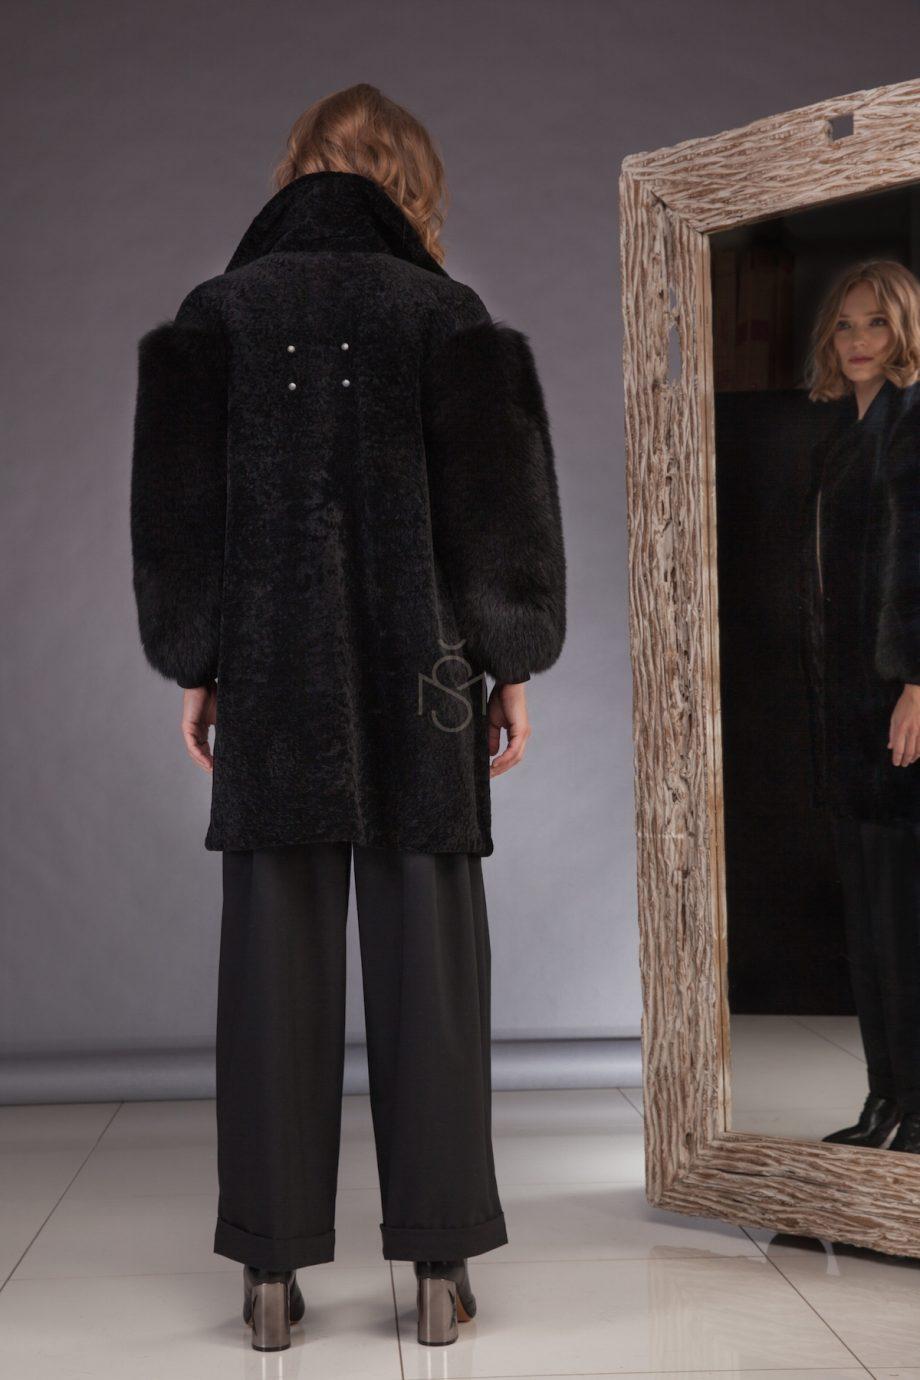 Sheepskin coat with fox fur sleeves_black_made by SILTA MADA fur studio in Vilnius